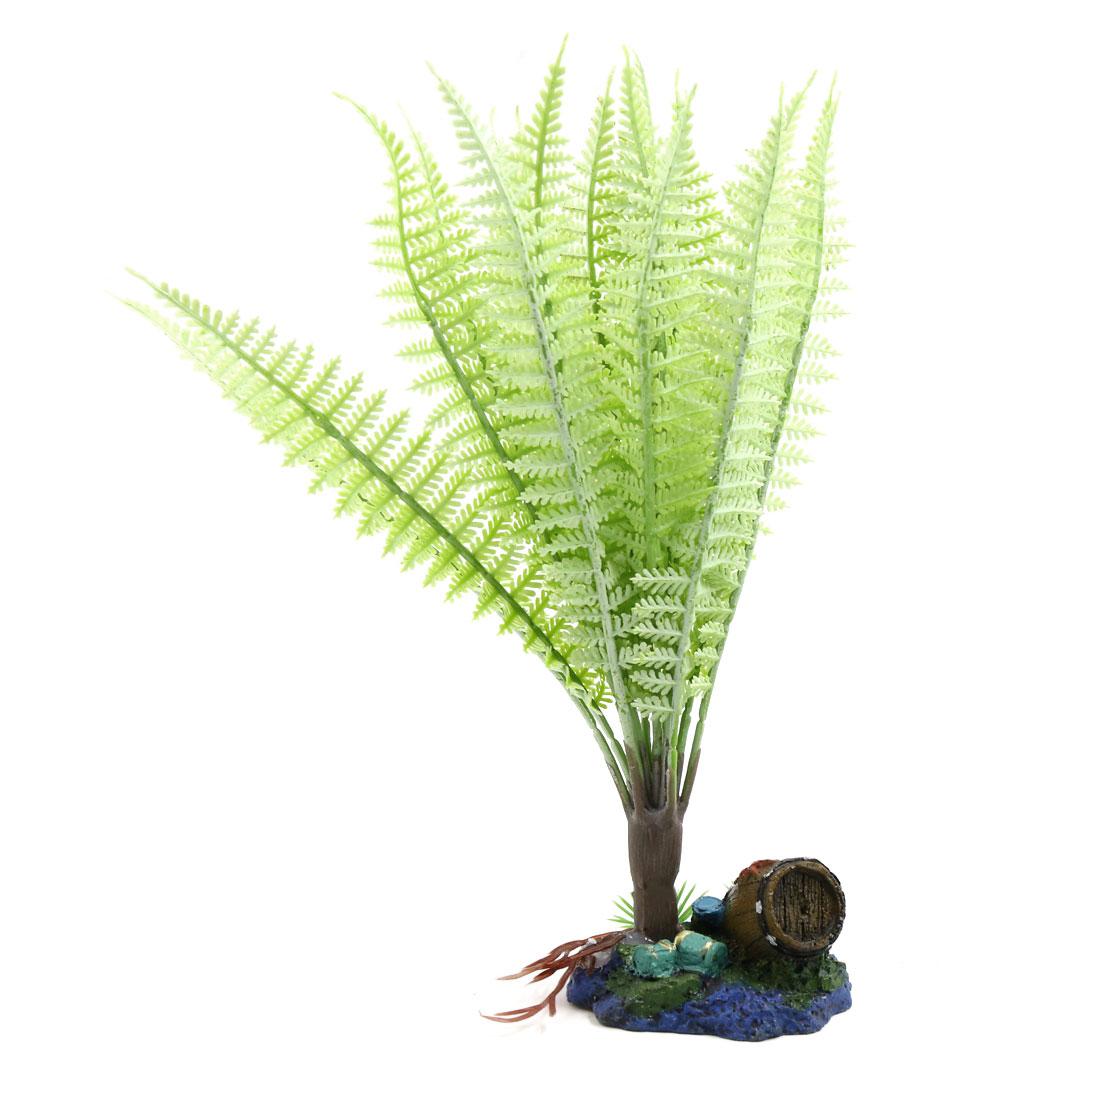 Light Green Plastic Plant Reptiles Tank Terrarium Landscape Decoration Ornament